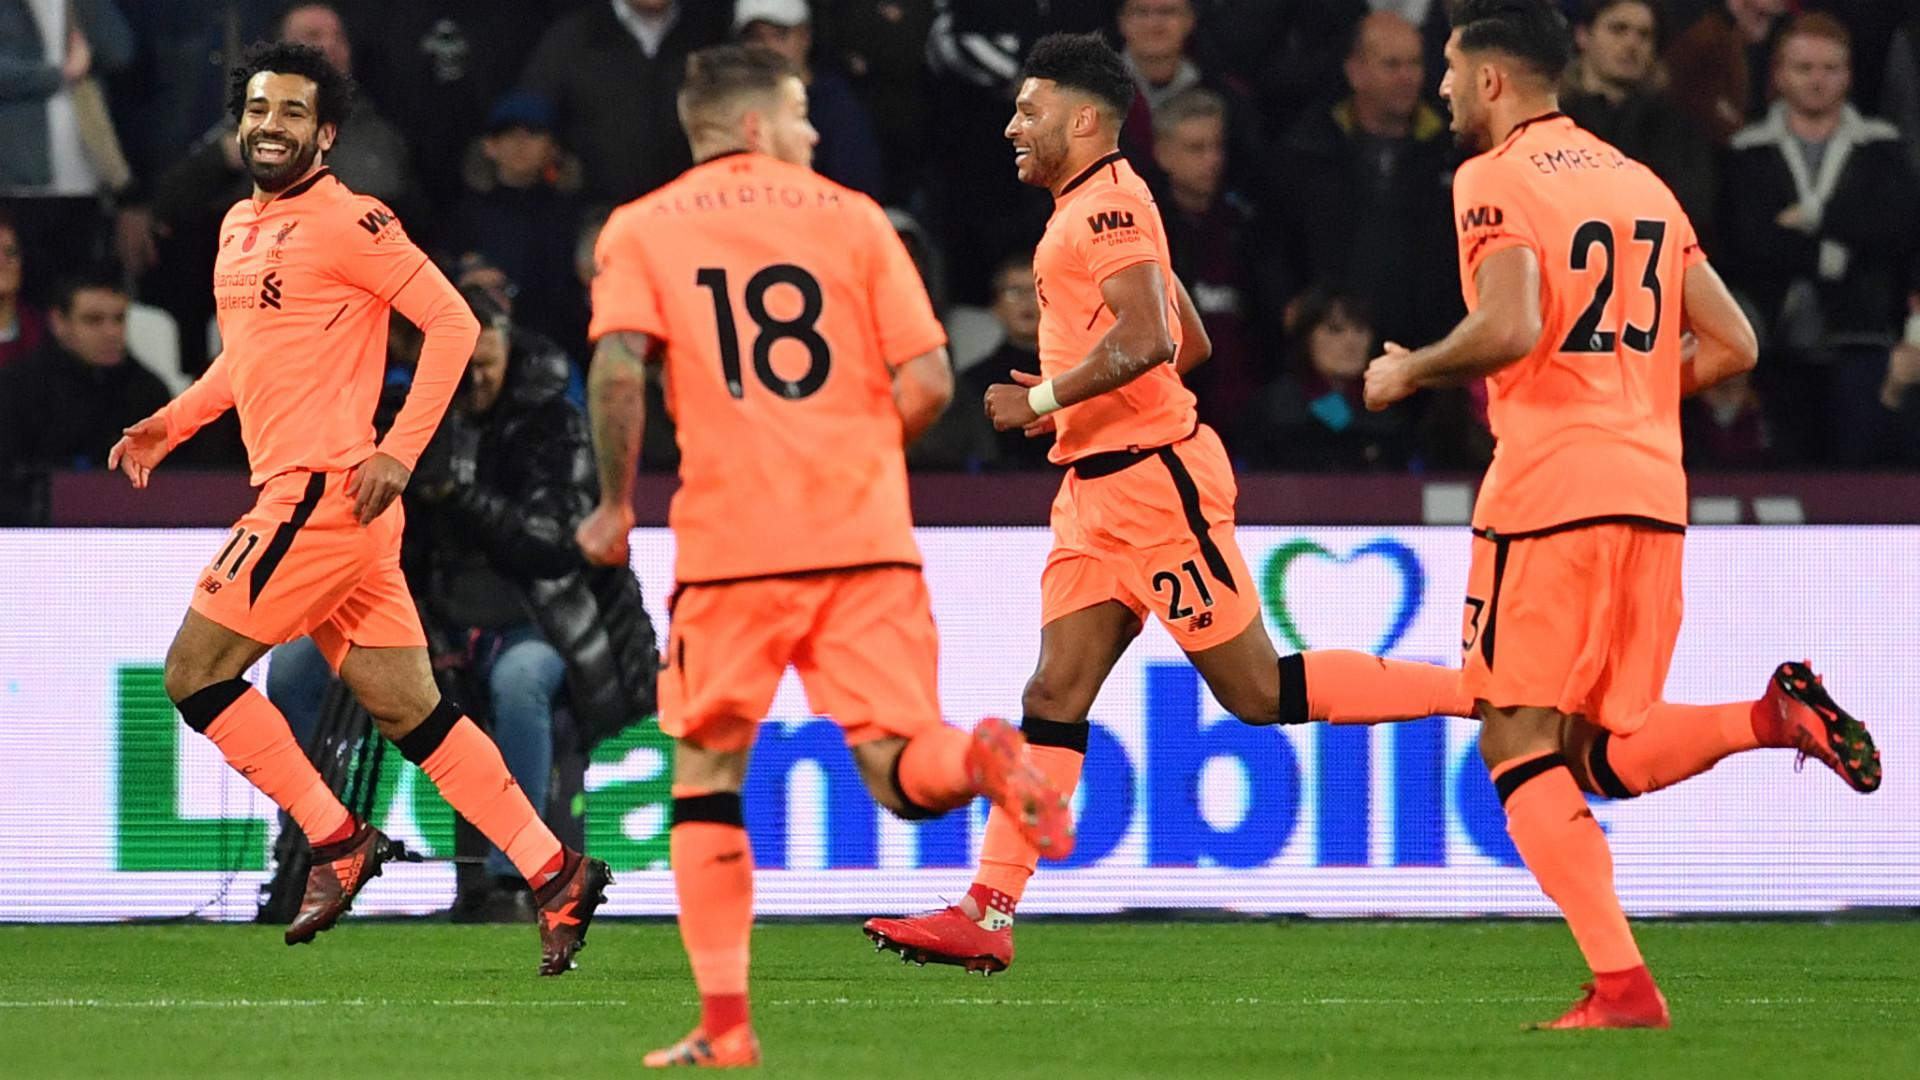 Salah Liverpool celebrates